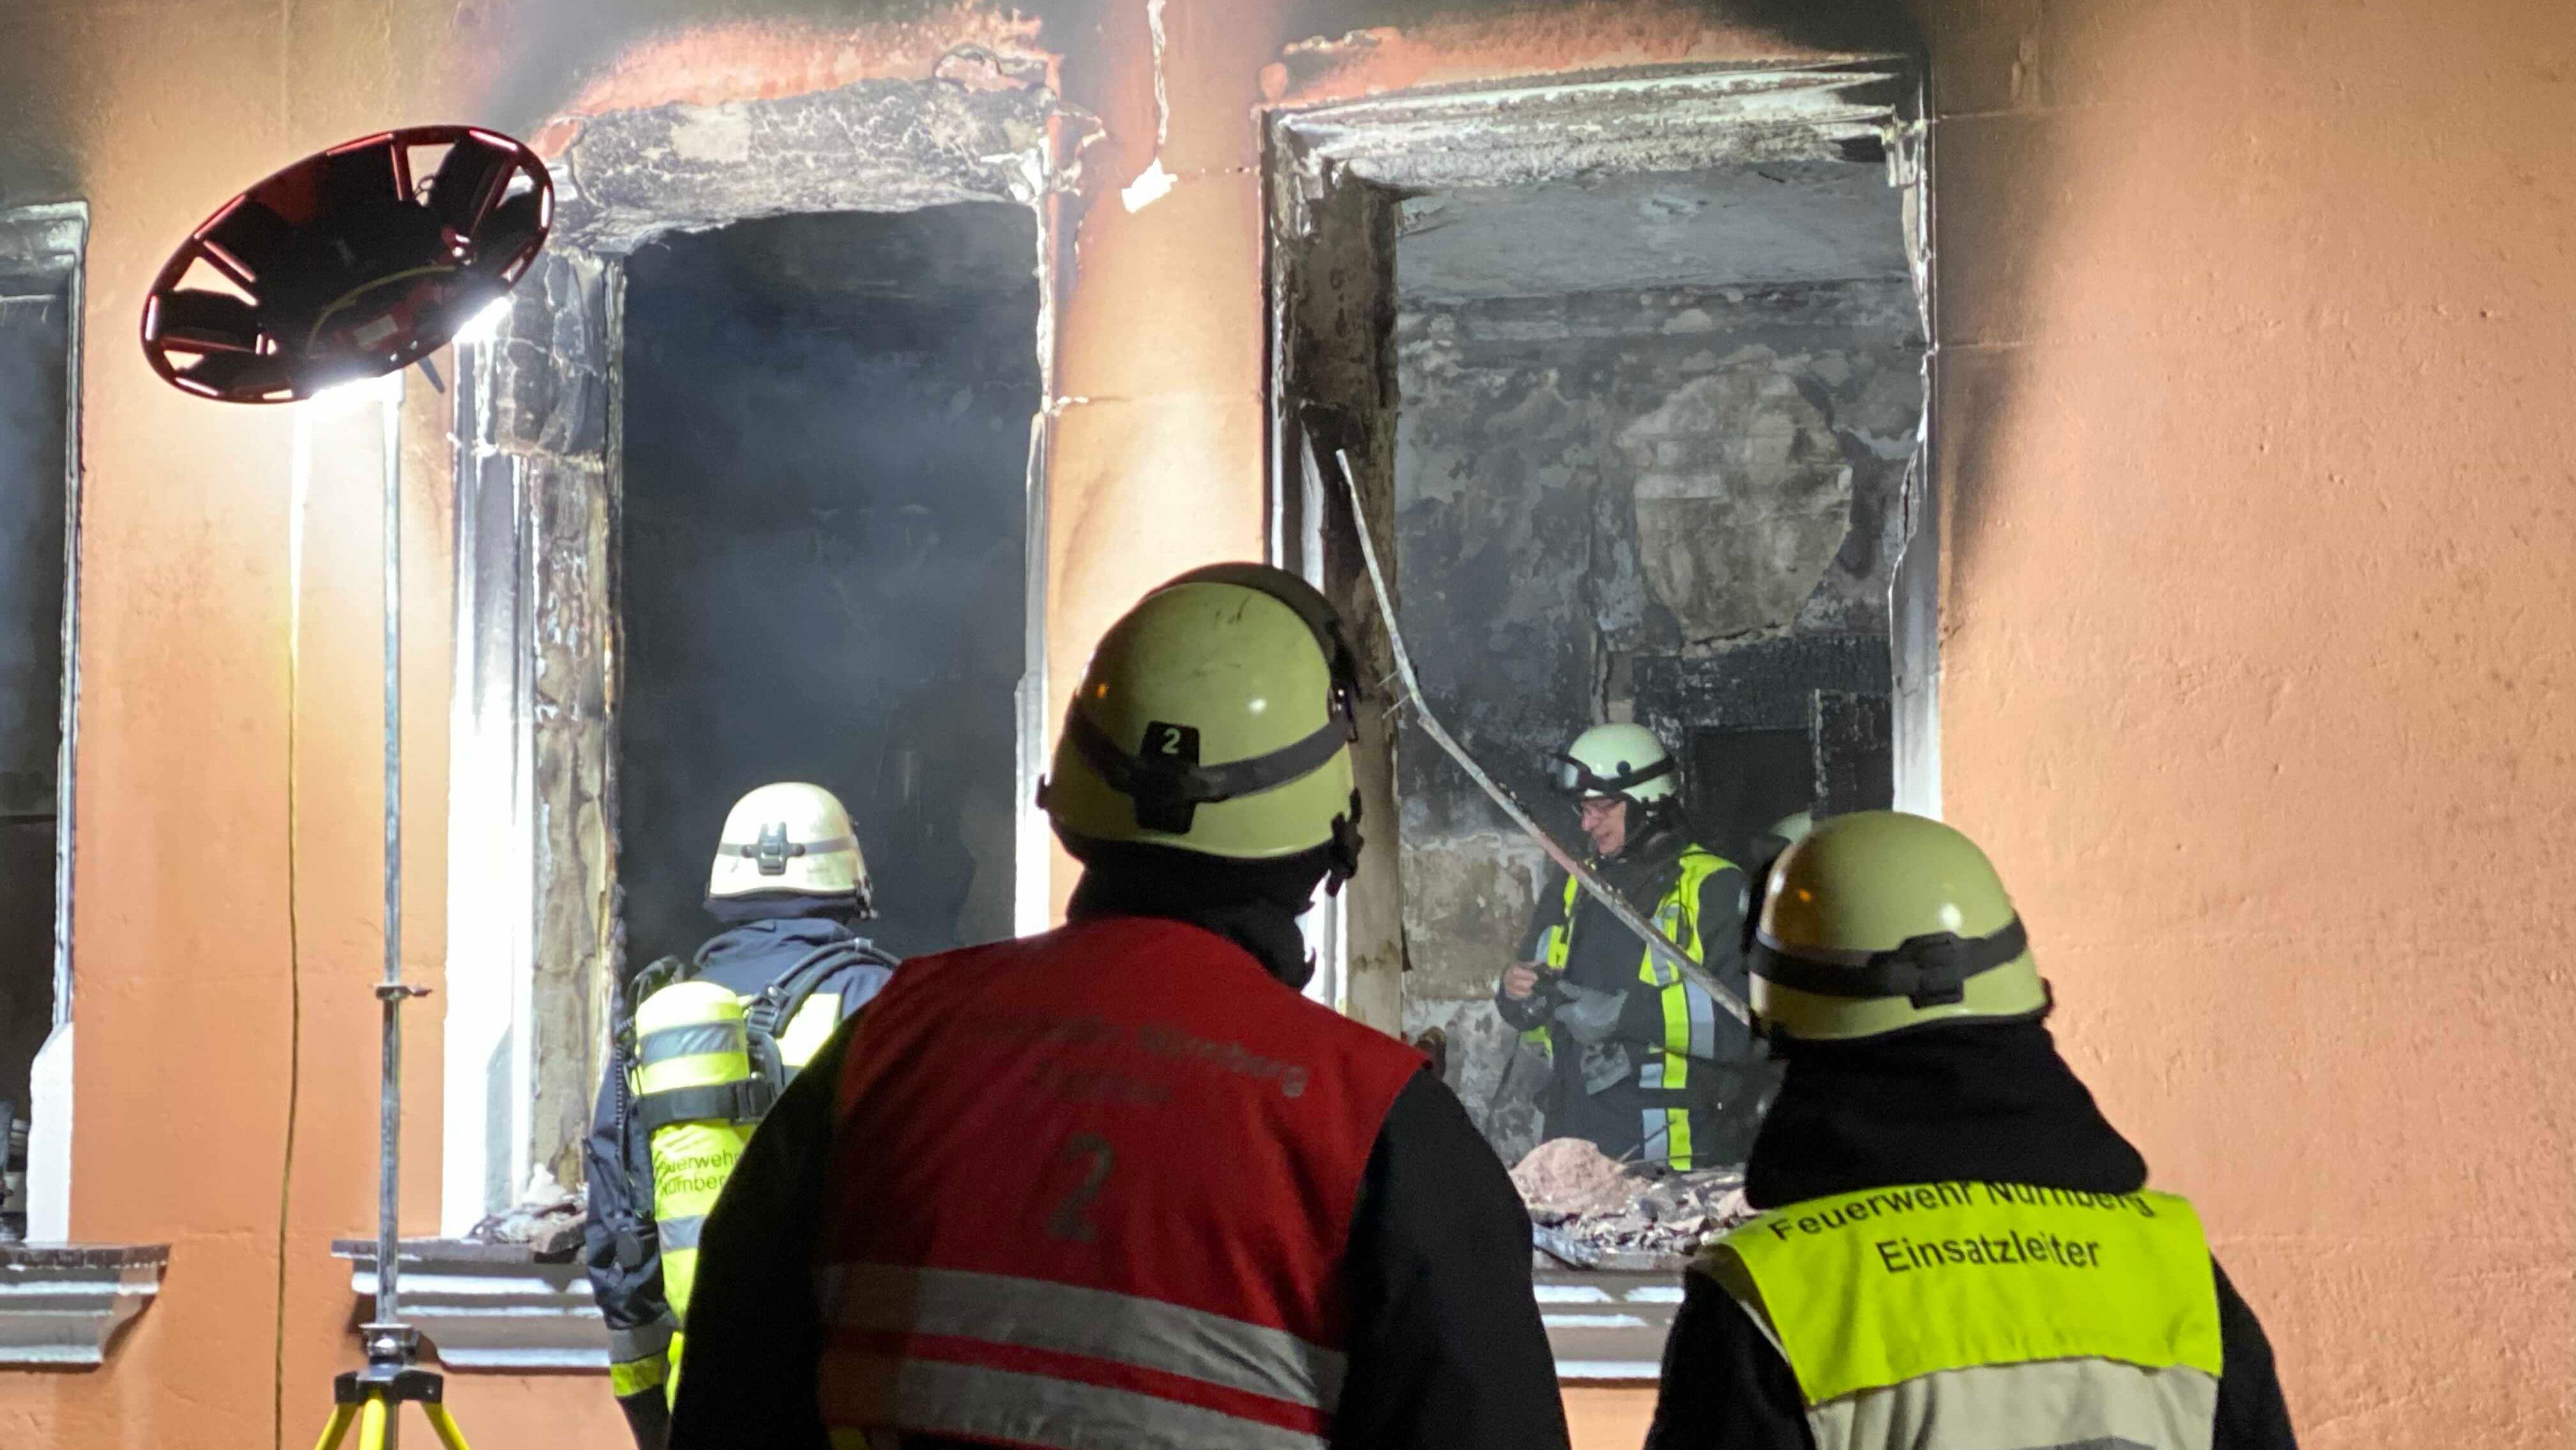 Frau stirbt bei Wohnungsbrand in Nürnberg